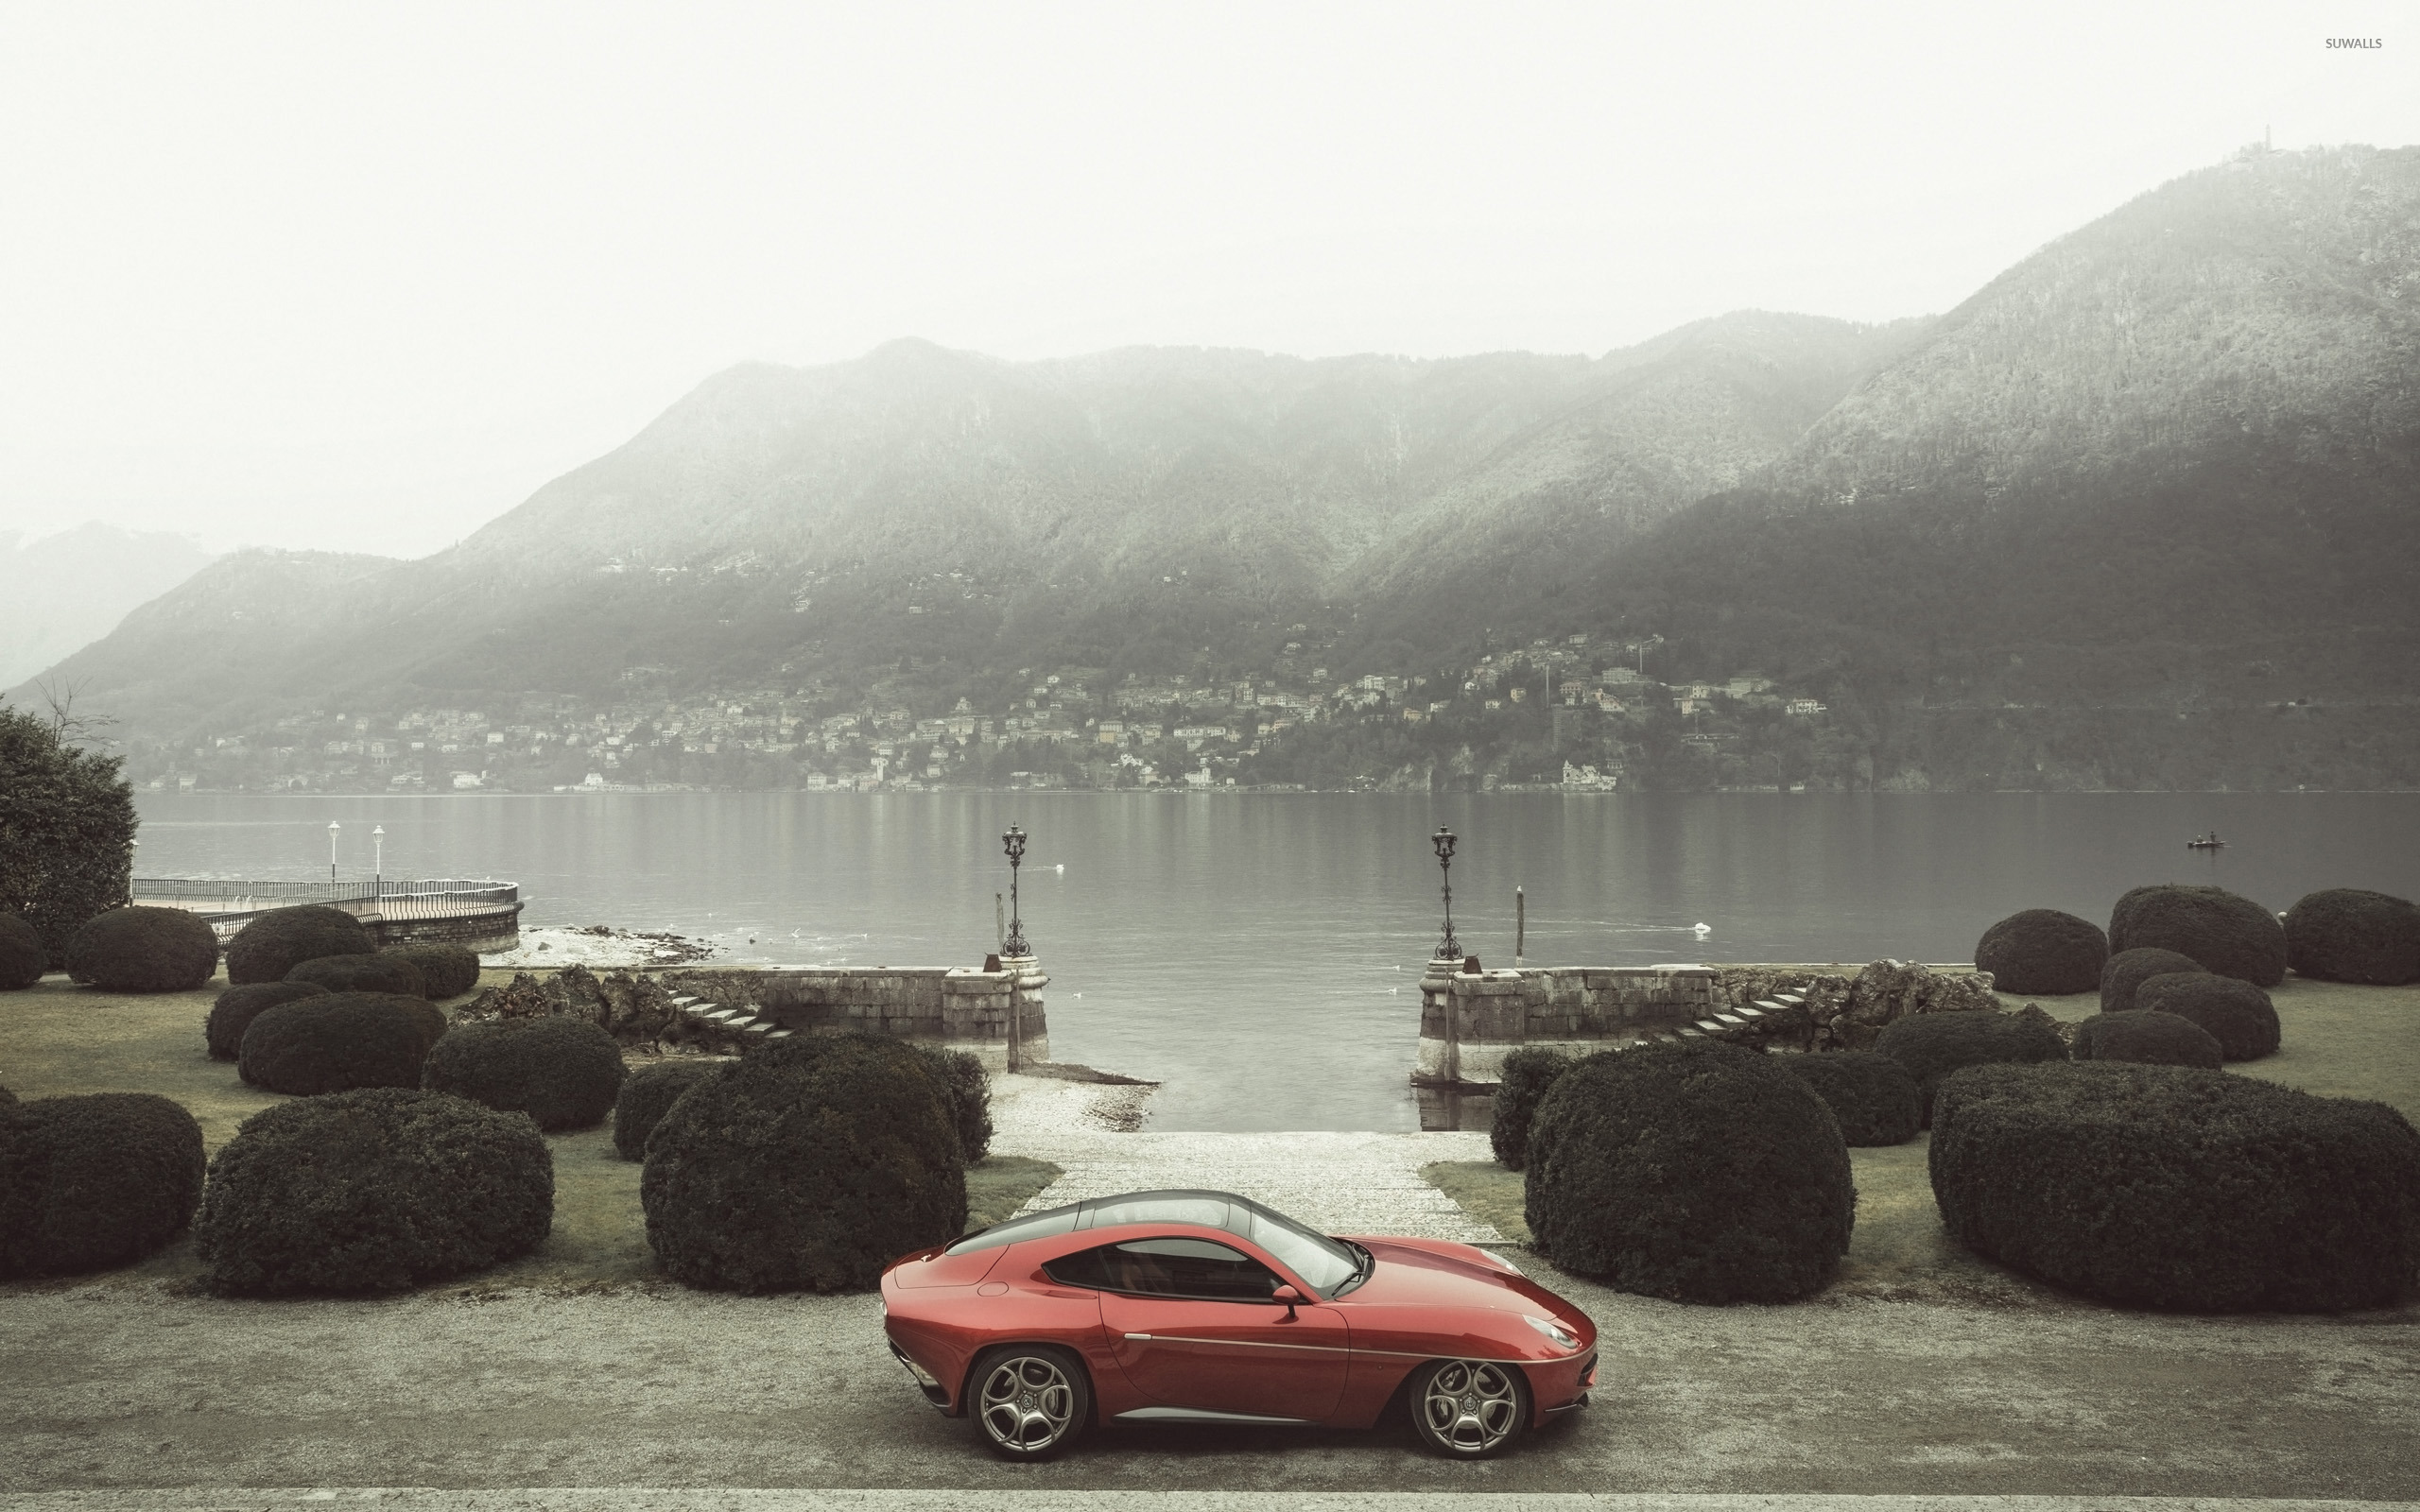 2012 Alfa Romeo Disco Volante [13] Wallpaper 2560x1600 Jpg